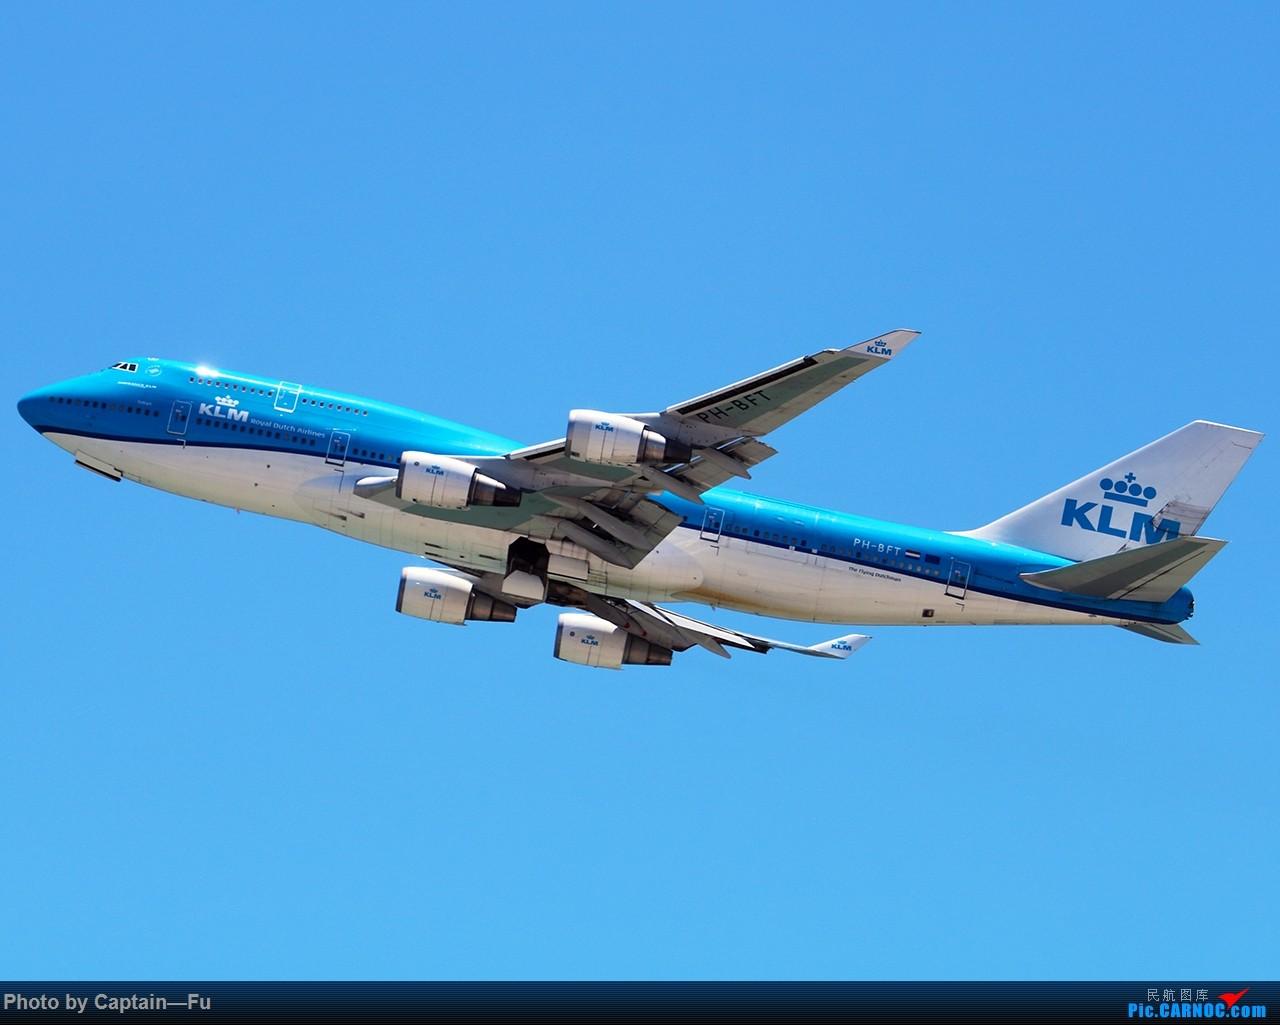 Re:[原创]香港拍机 BOEING 747-400 PH-BFT 中国香港国际机场